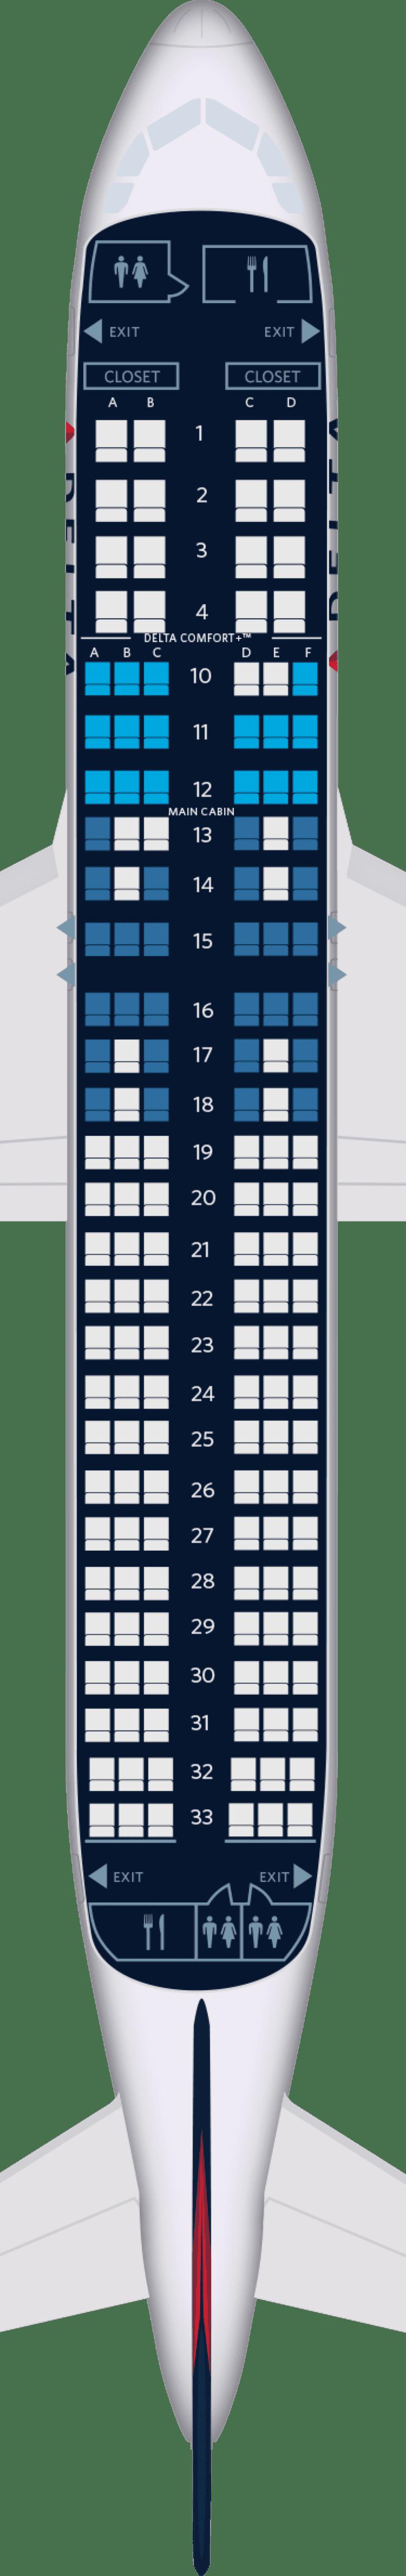 Airbus A320 Aircraft Seat Maps  Specs  U0026 Amenities